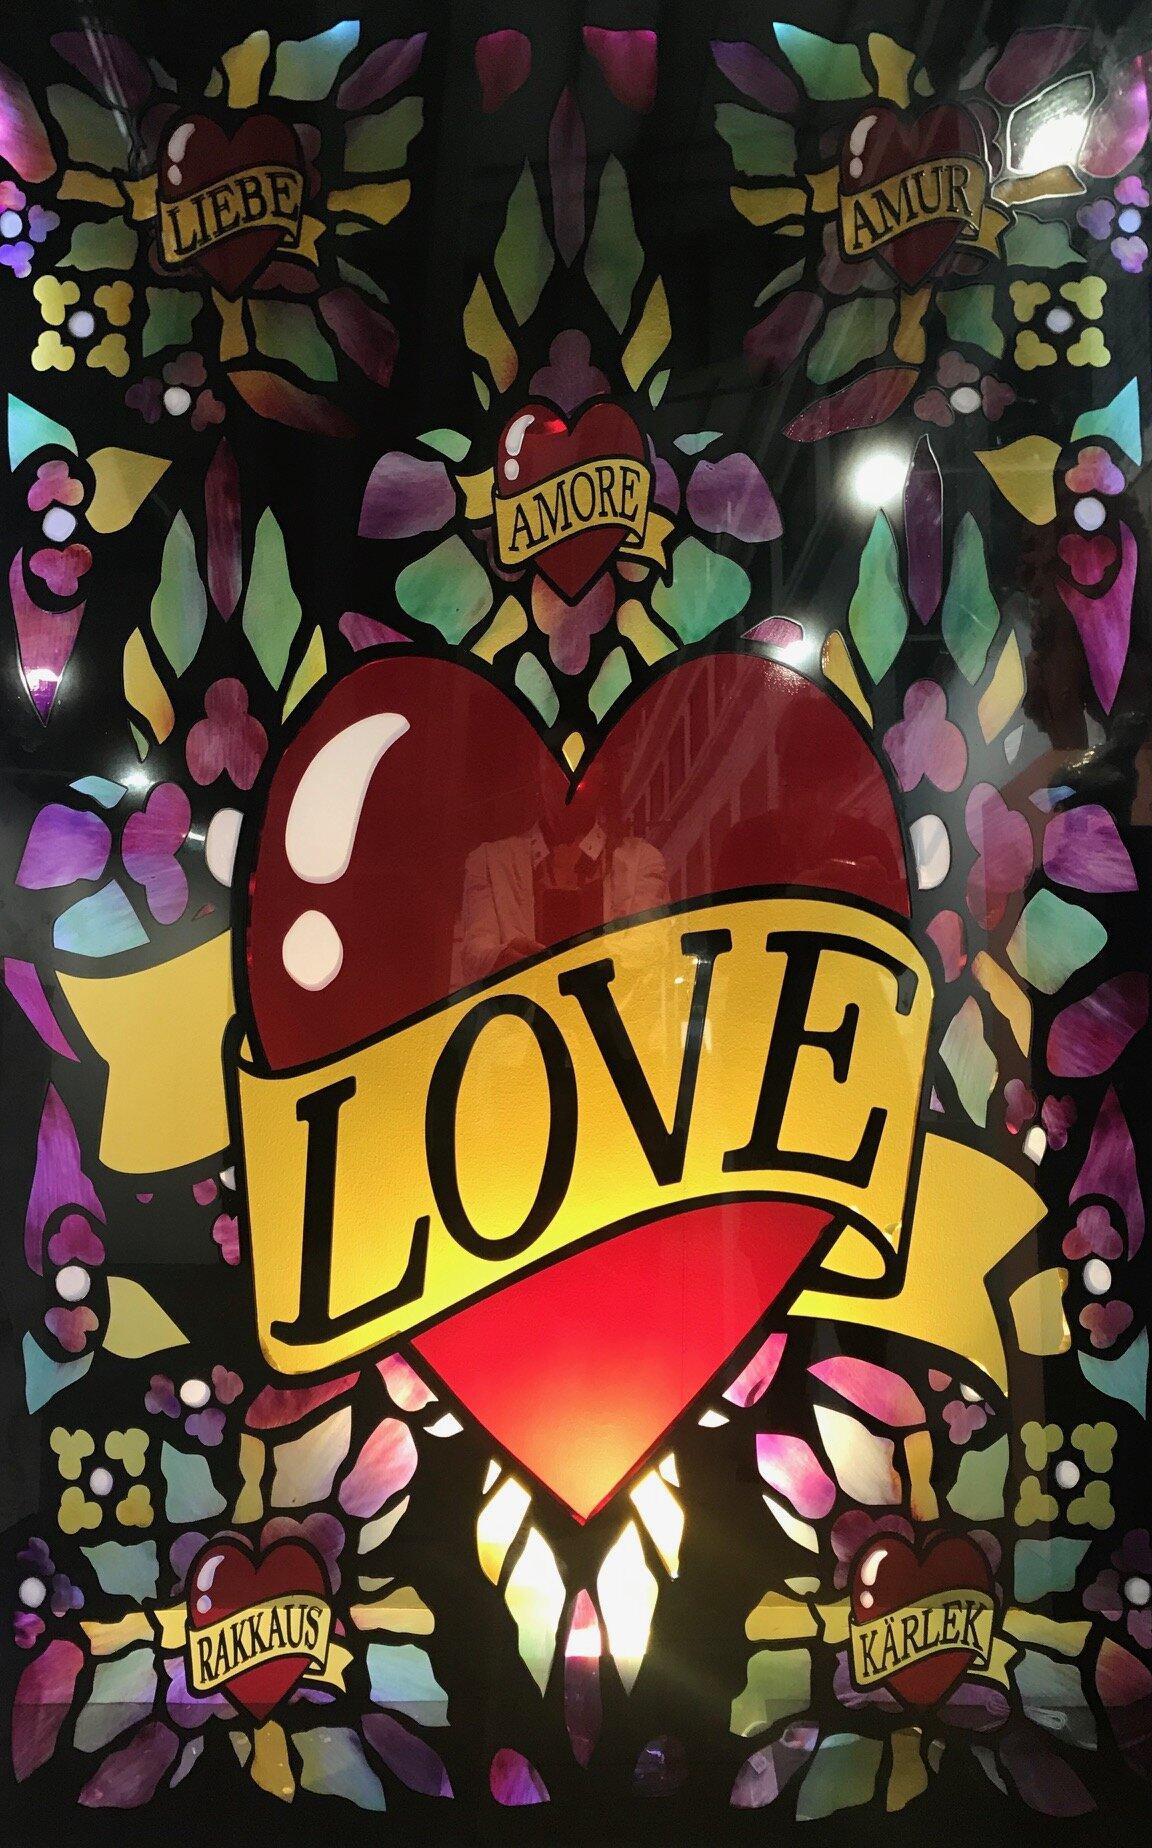 Jani Leinonen_We Find Love in Hopeless Place_2019_99 x 155 cm_ Hand paint ceramic melting colour on glass.jpg